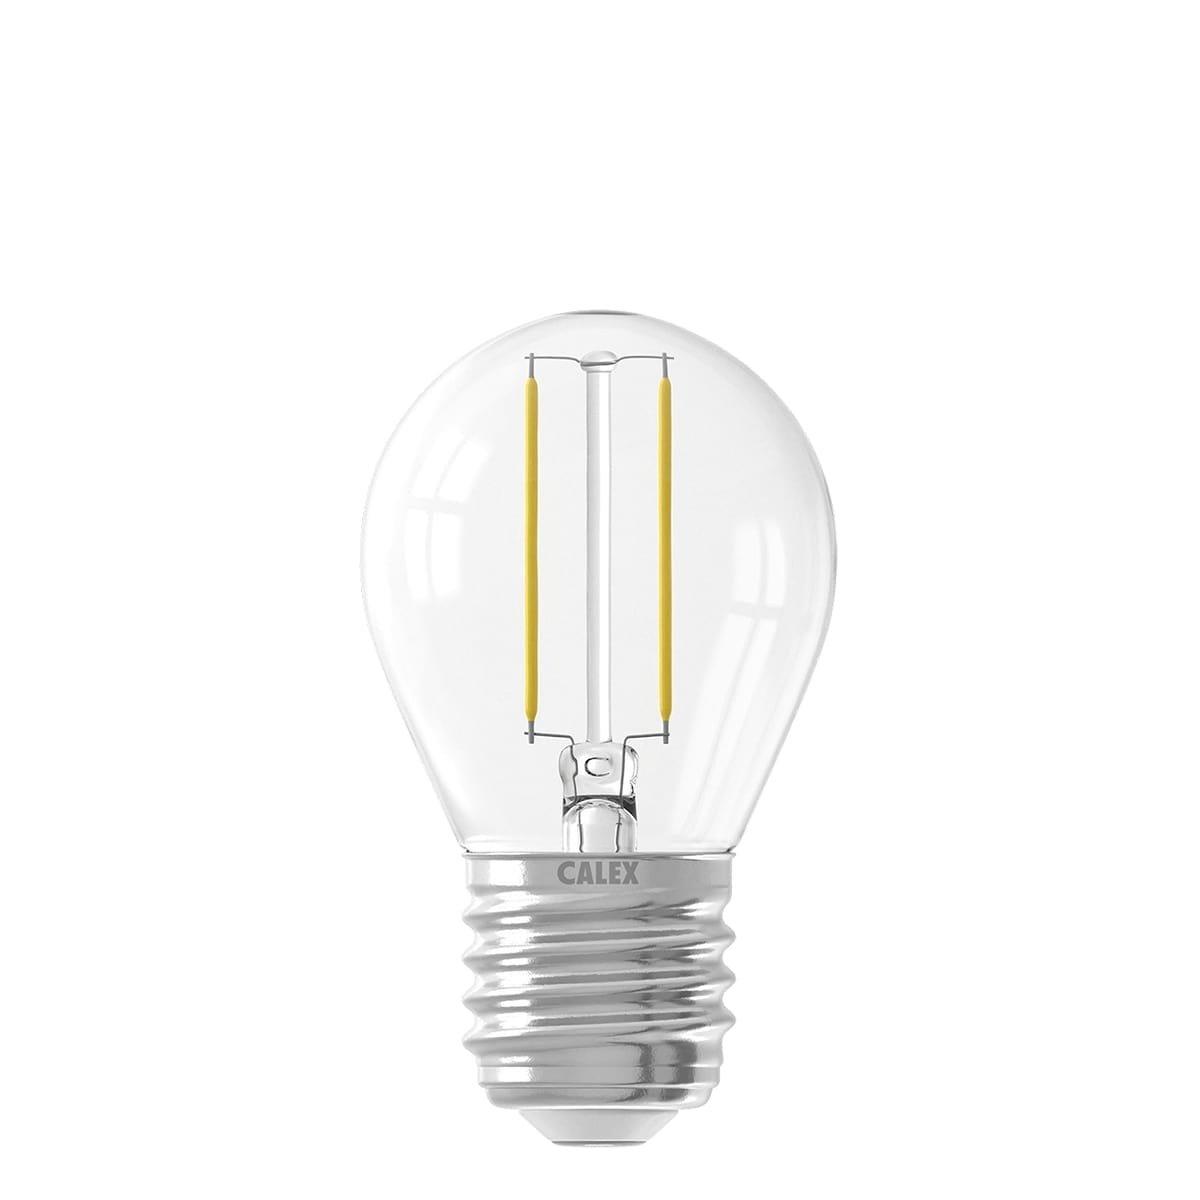 Outdoor Lighting Light Sources Led bullet lamp Mini Globe Bright - 3.5W